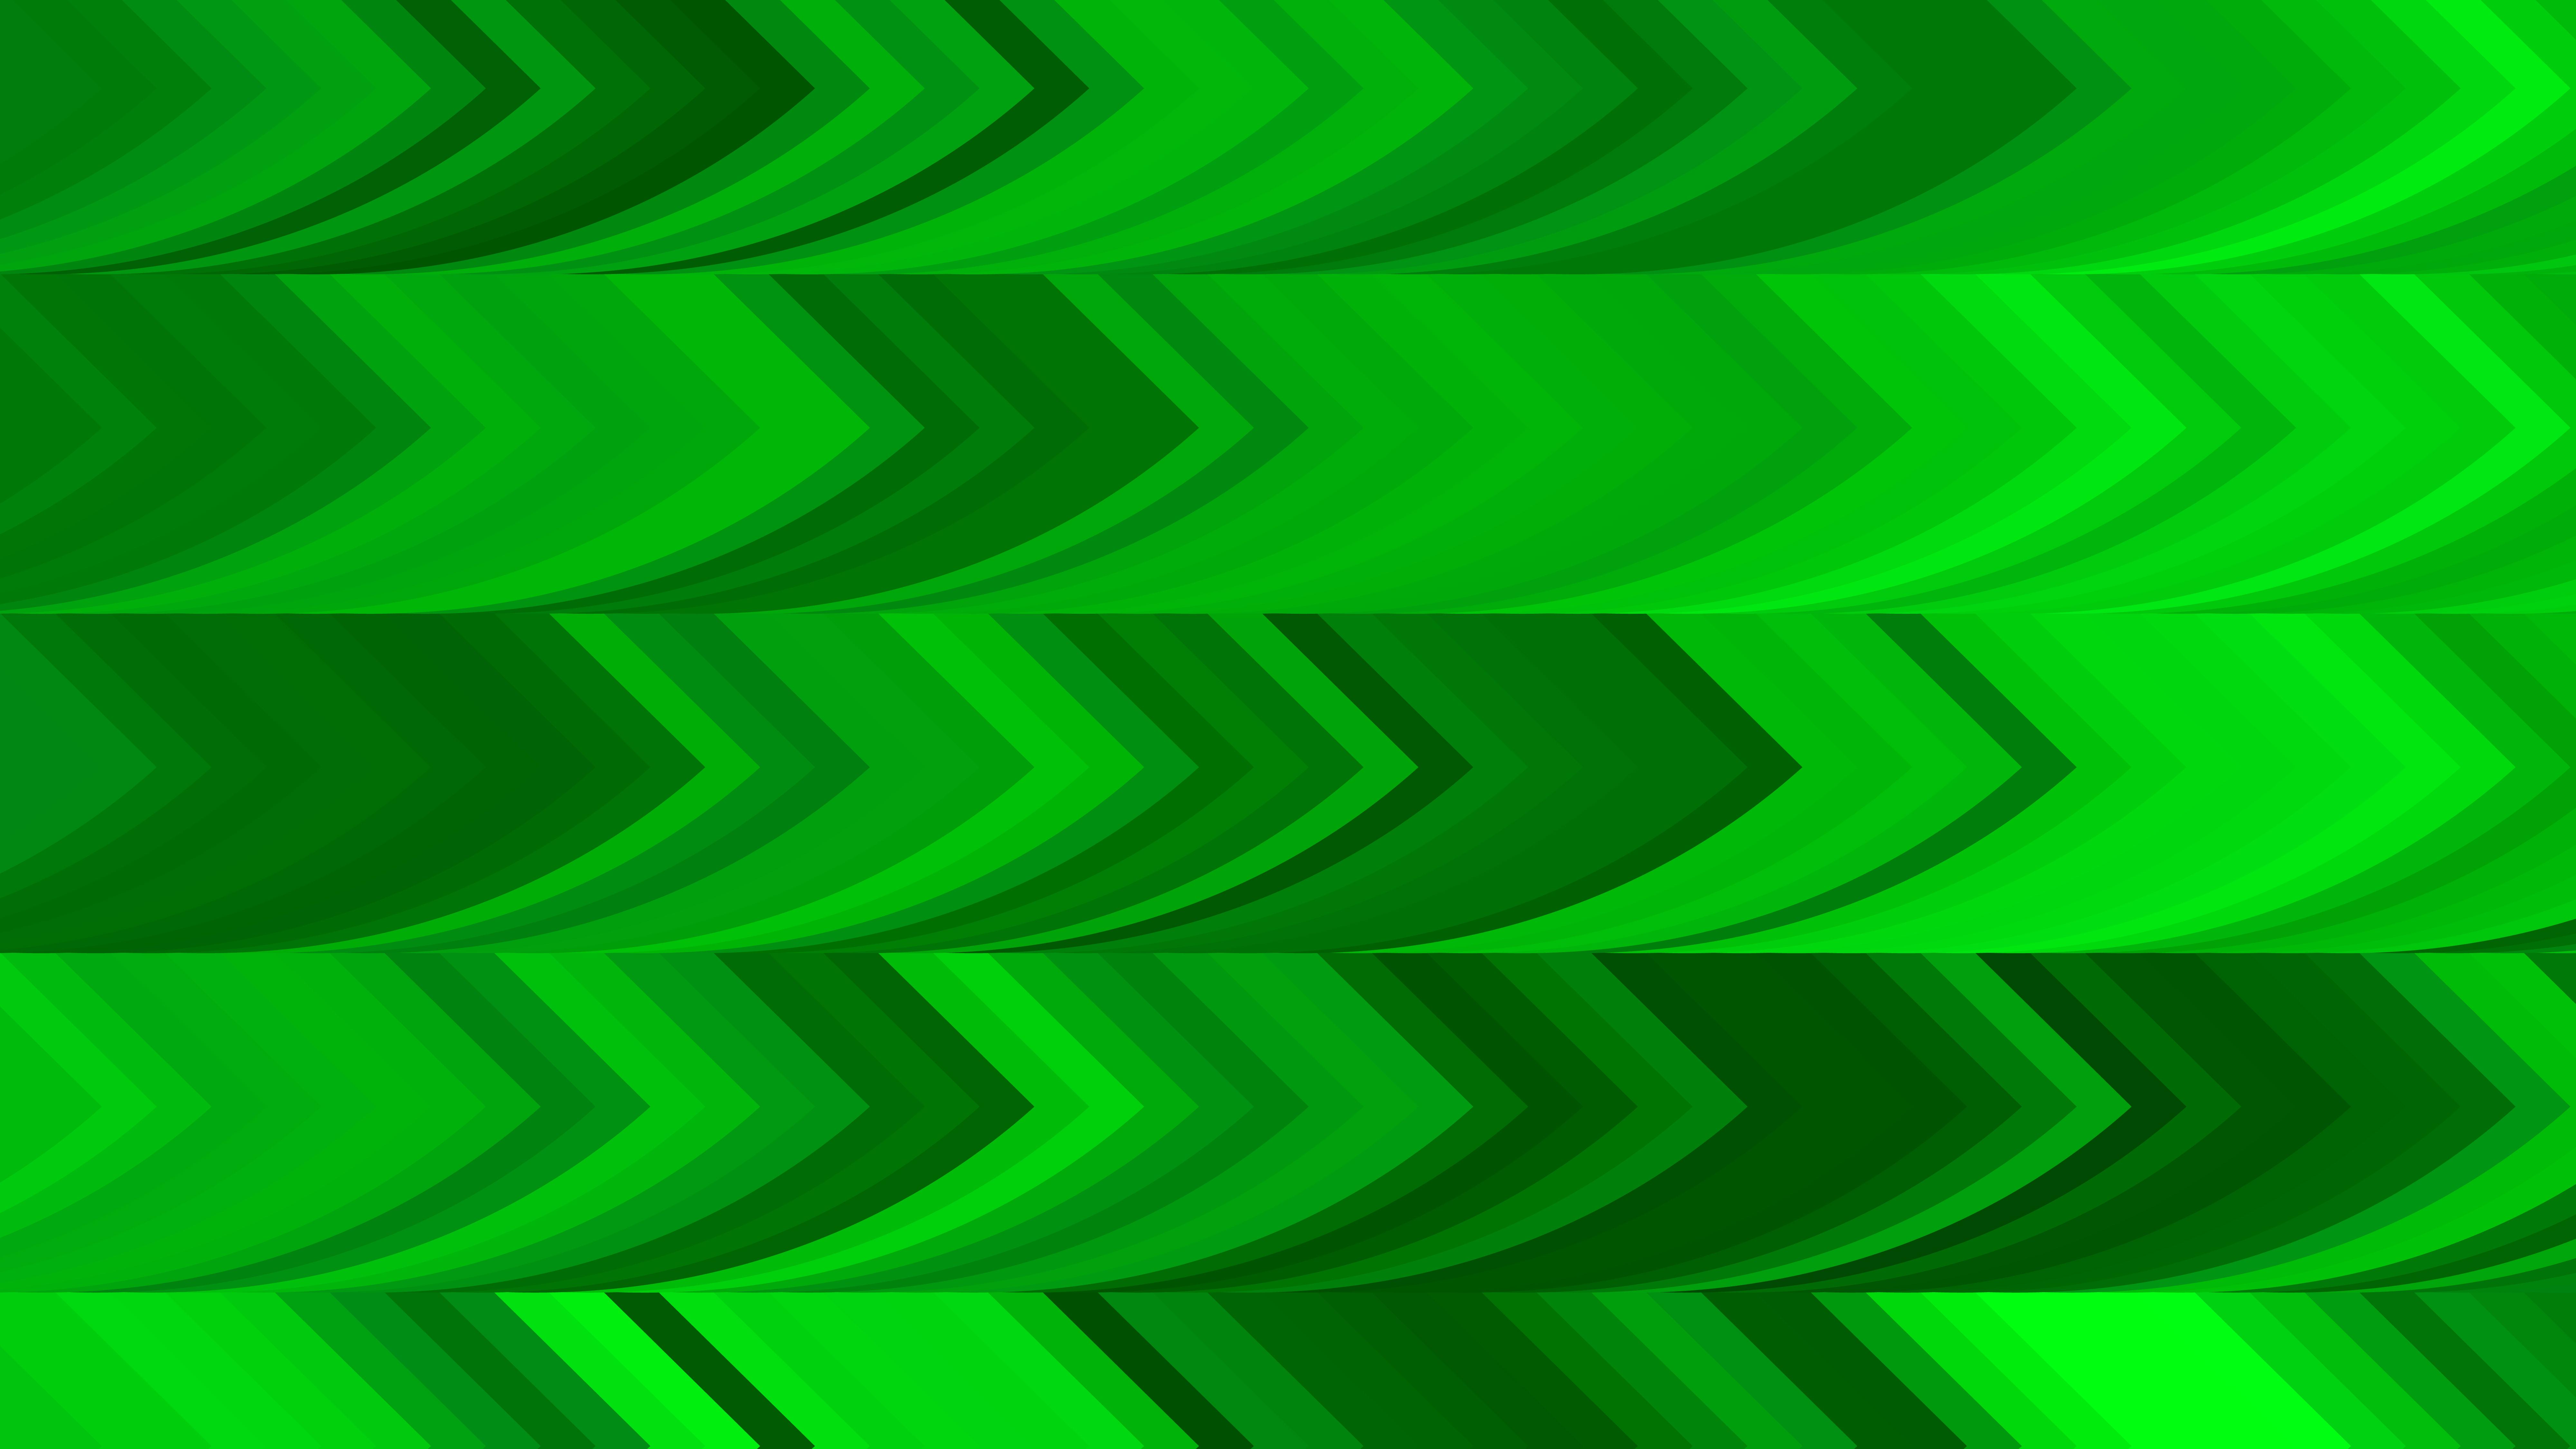 Neon Green Abstract Background Illustrator